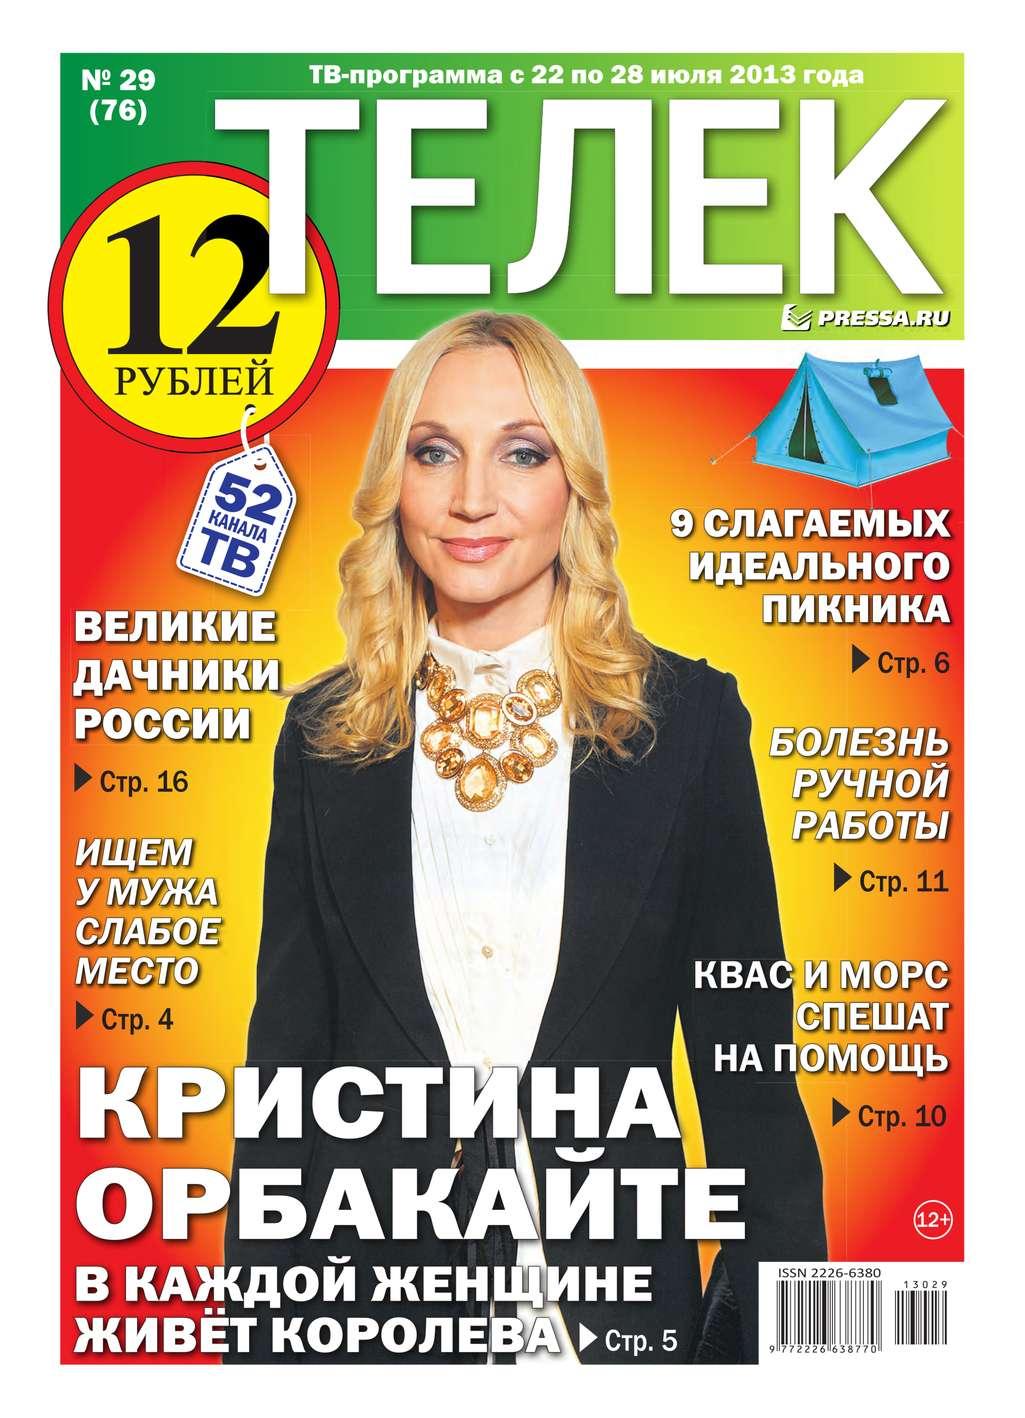 Фото - Редакция газеты Телек Pressa.ru Телек 29-2013 газеты